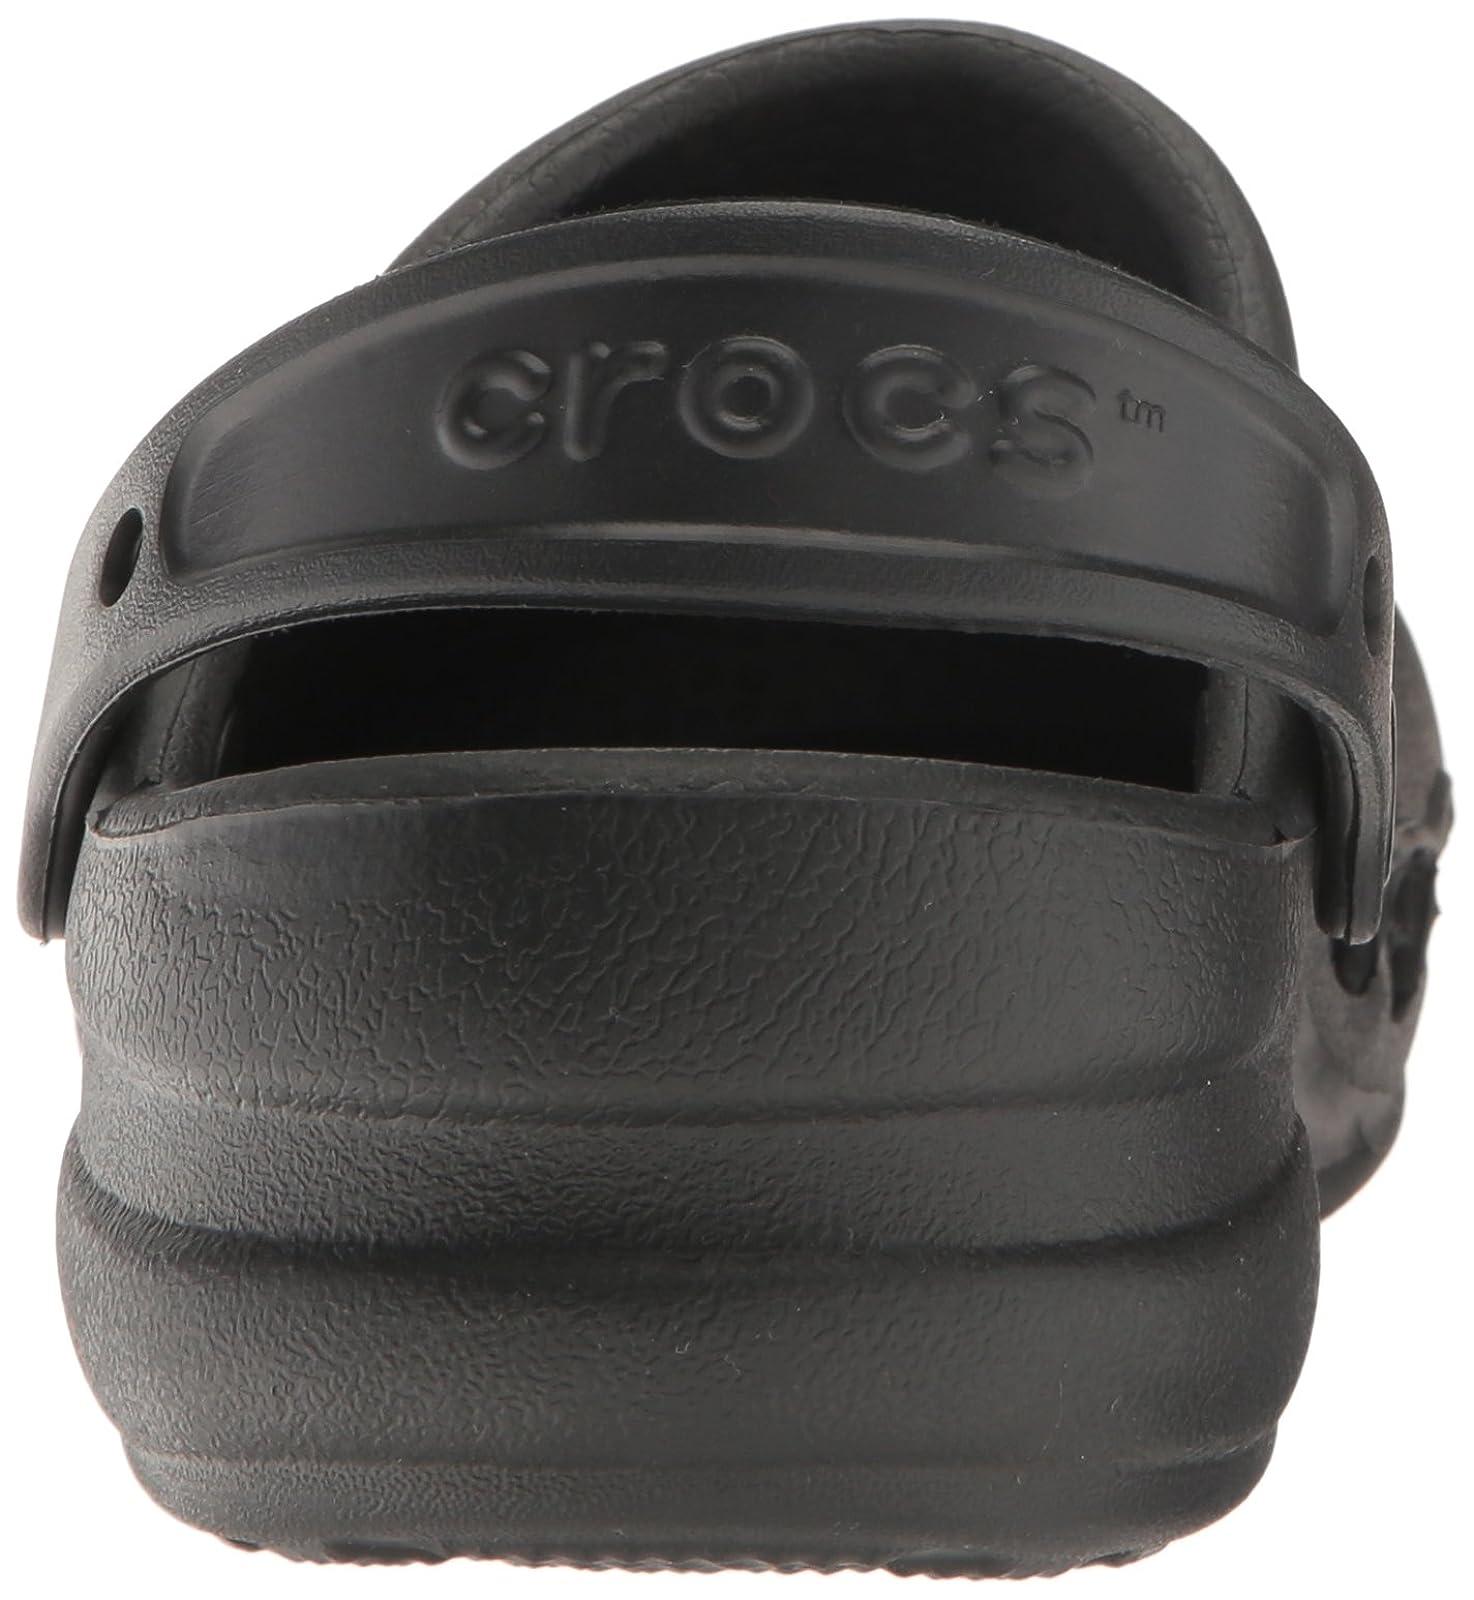 Crocs Unisex Specialist Vent Clog Black 11 10074M Black - 2